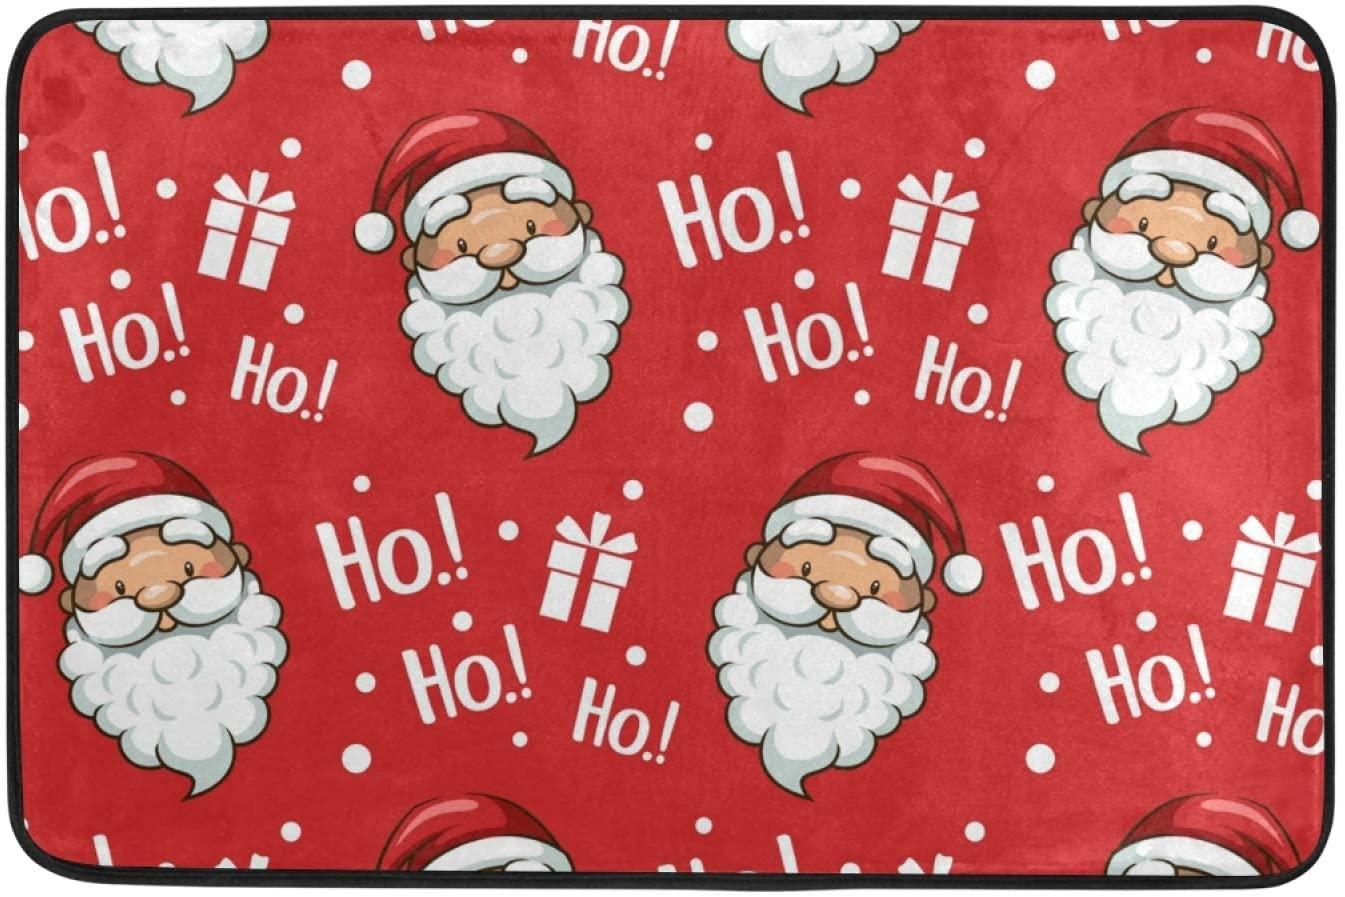 Moudou Christmas Santa Claus Doormat Non Slip Floor Mat Indoor Outdoor Entrance Kitchen Bath Garden Carpet 23.6 x 15.7 Inch